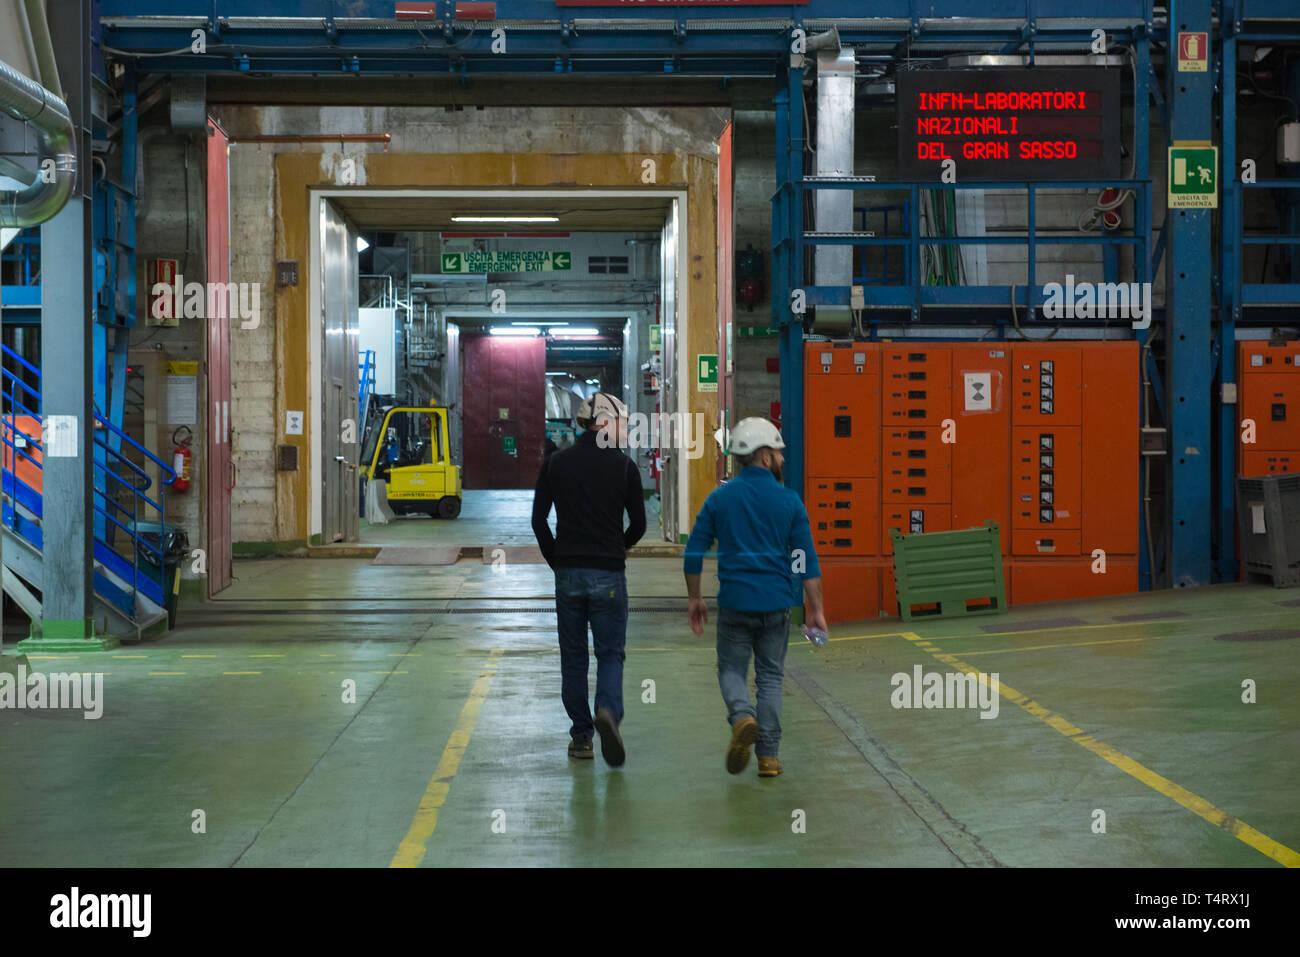 Assergi (l'Aquila), INFN Laboratory for studies of sub-nuclear physics and astrophysics. Stock Photo